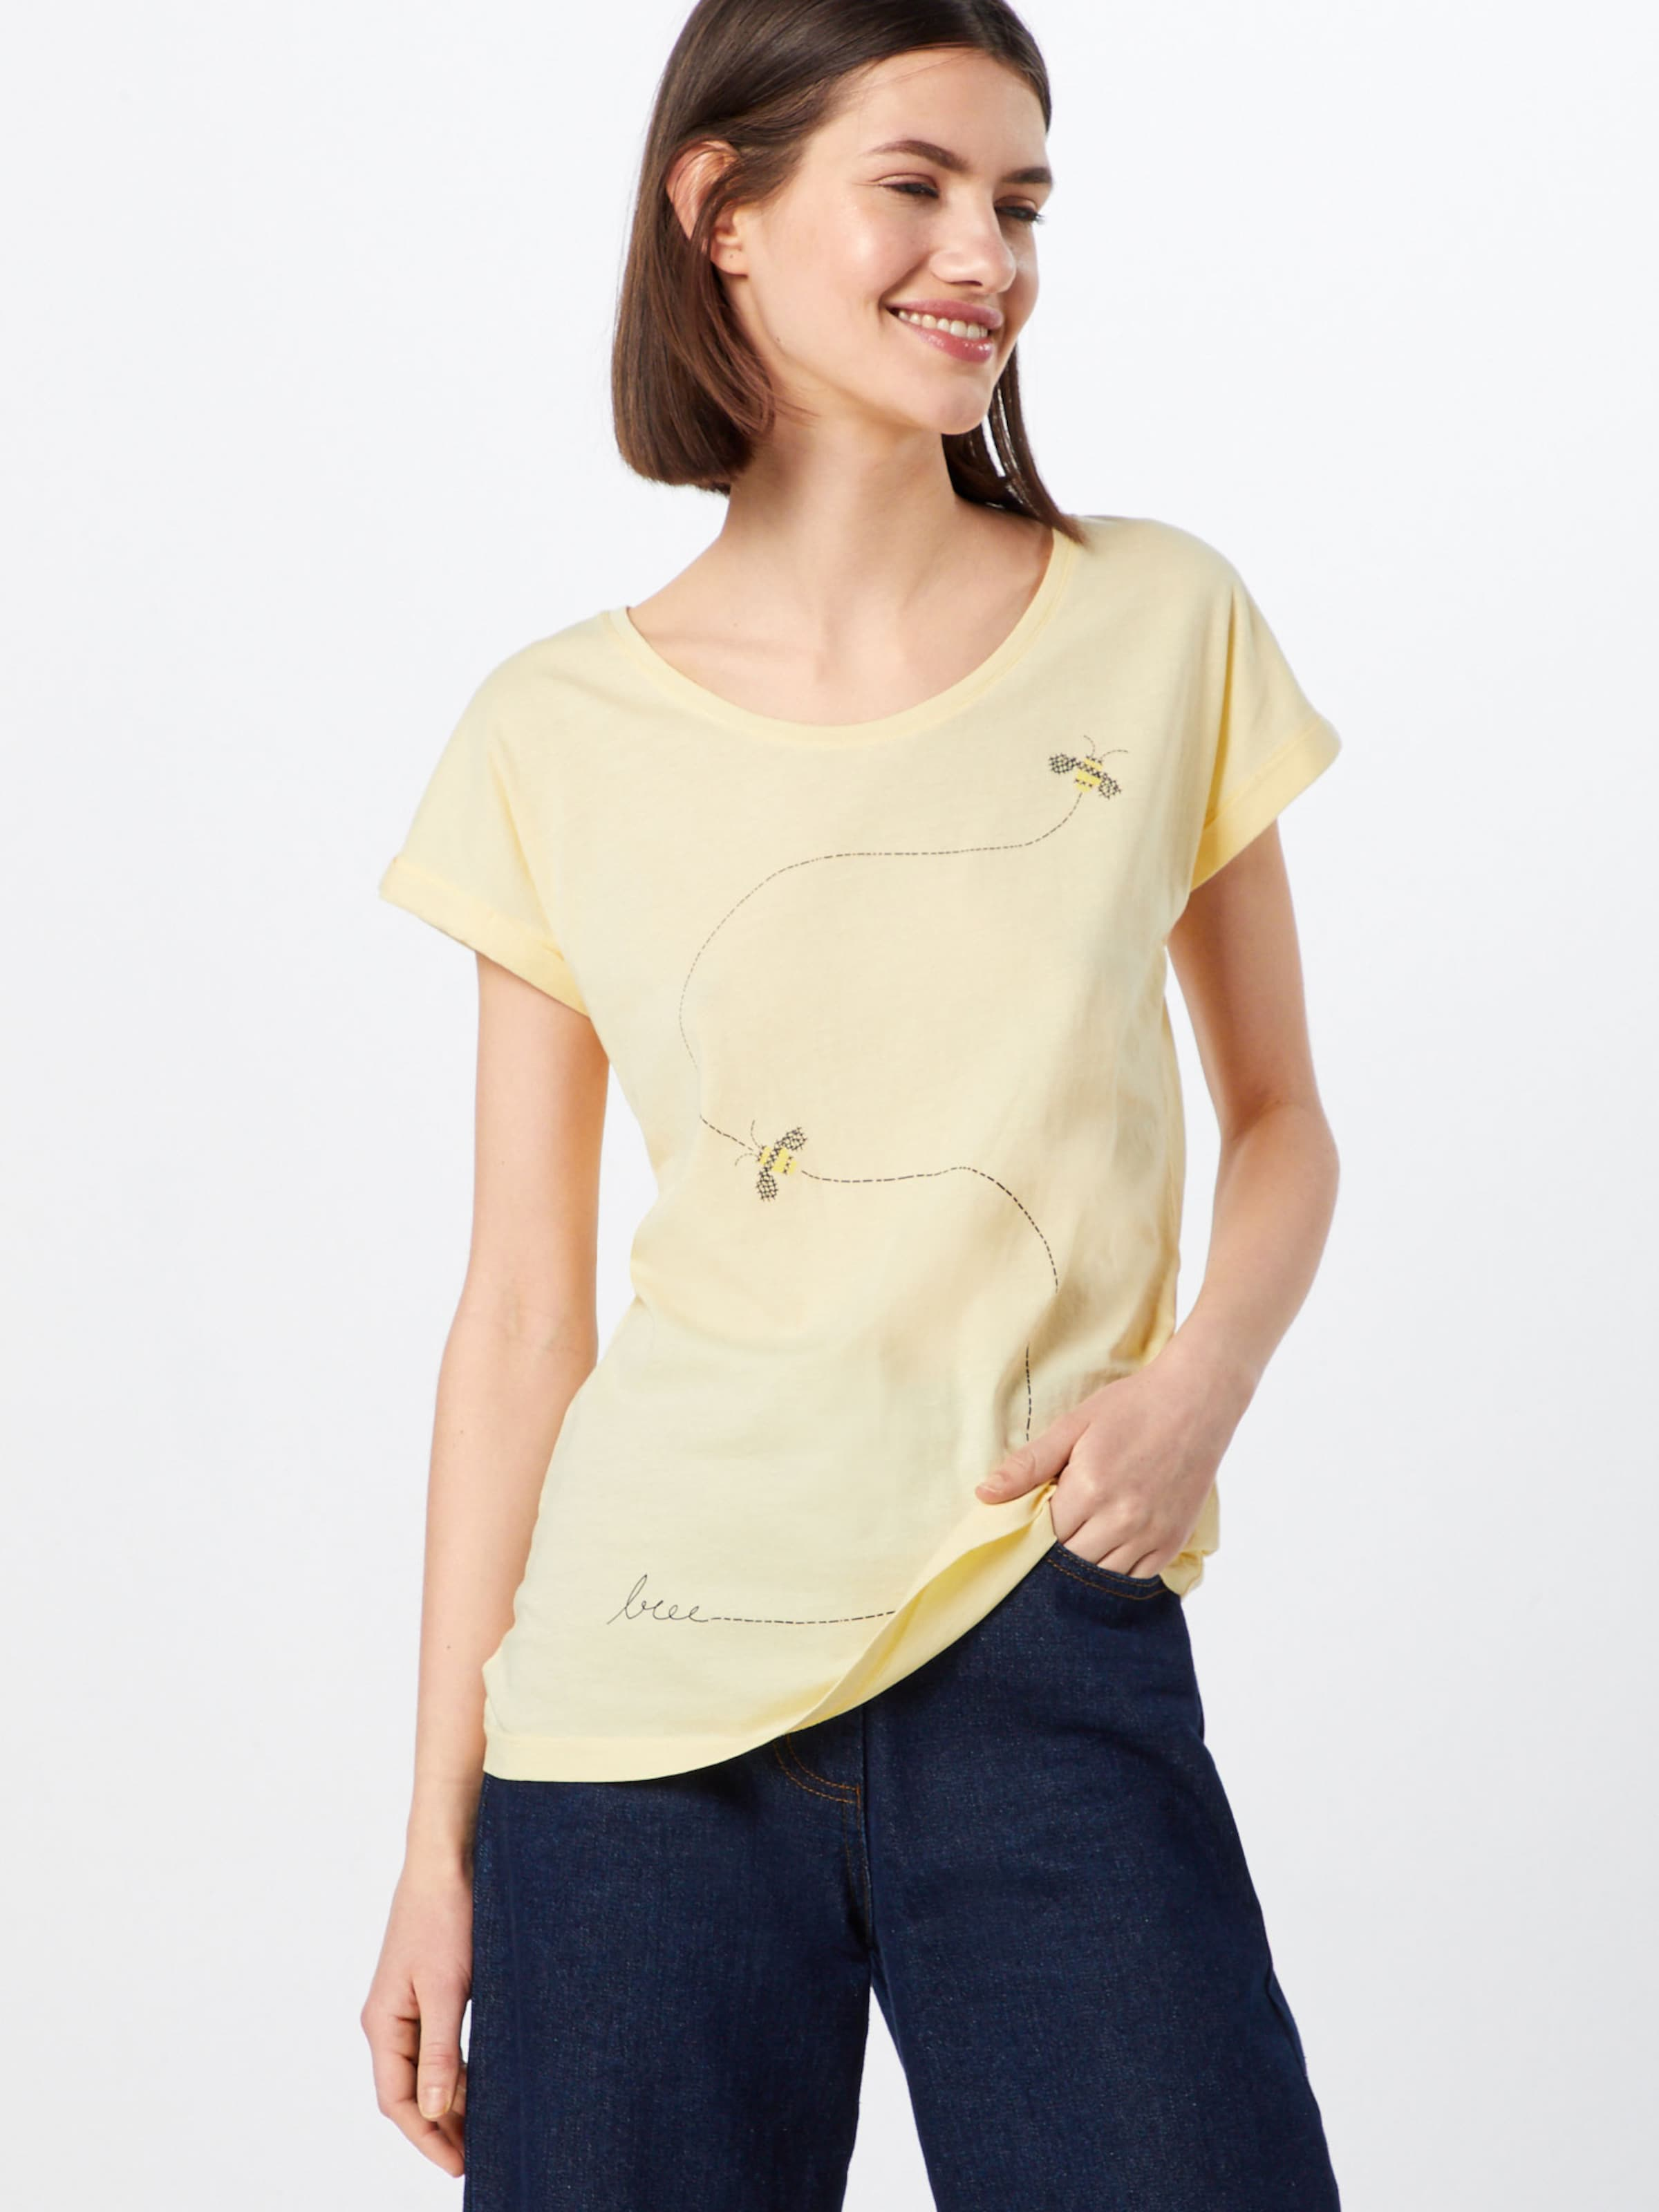 Bee' Armedangels 'livaa In Shirt Gelb Flying 54RLAj